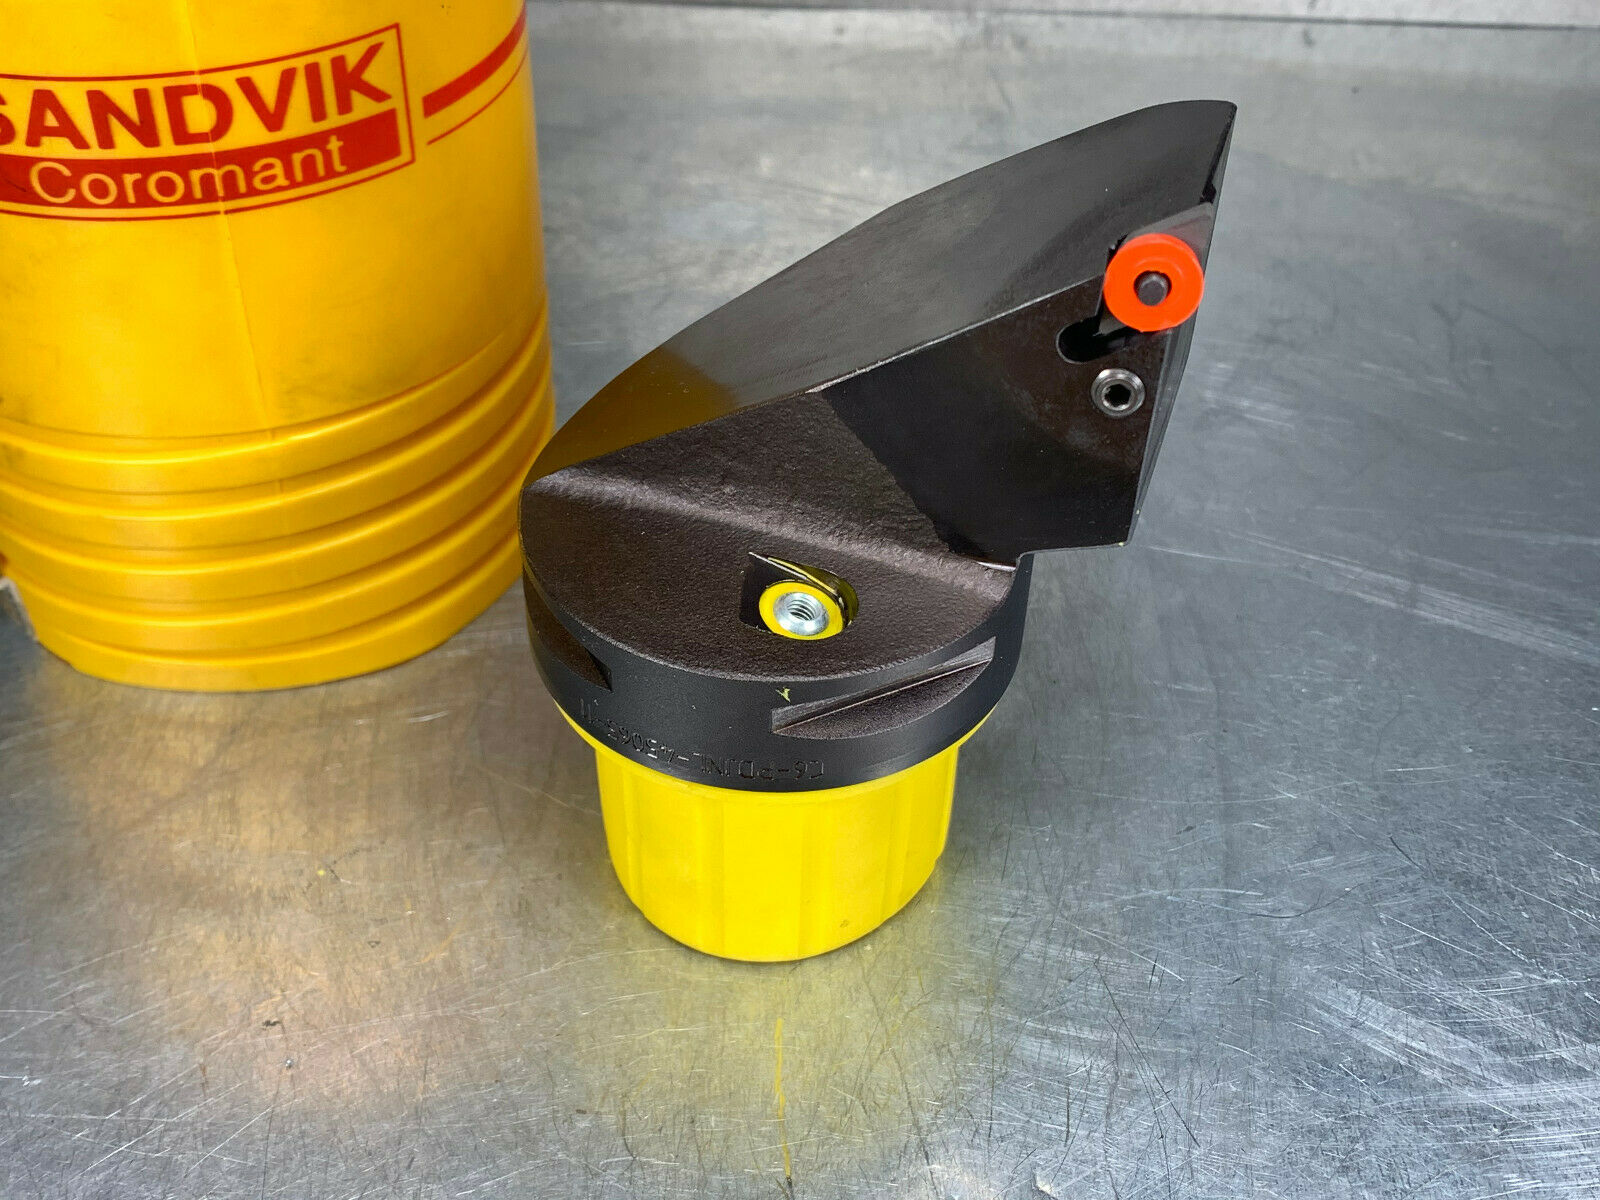 35 mm Functional Width 65 mm Functional Length 44 mm Shank Diameter Cx-DCRNR//L Tool Right Hand Sandvik Coromant C6-DCRNR-35065-12 T-Max P Cutting Unit for Turning CNMG 12 04 08 Master Insert